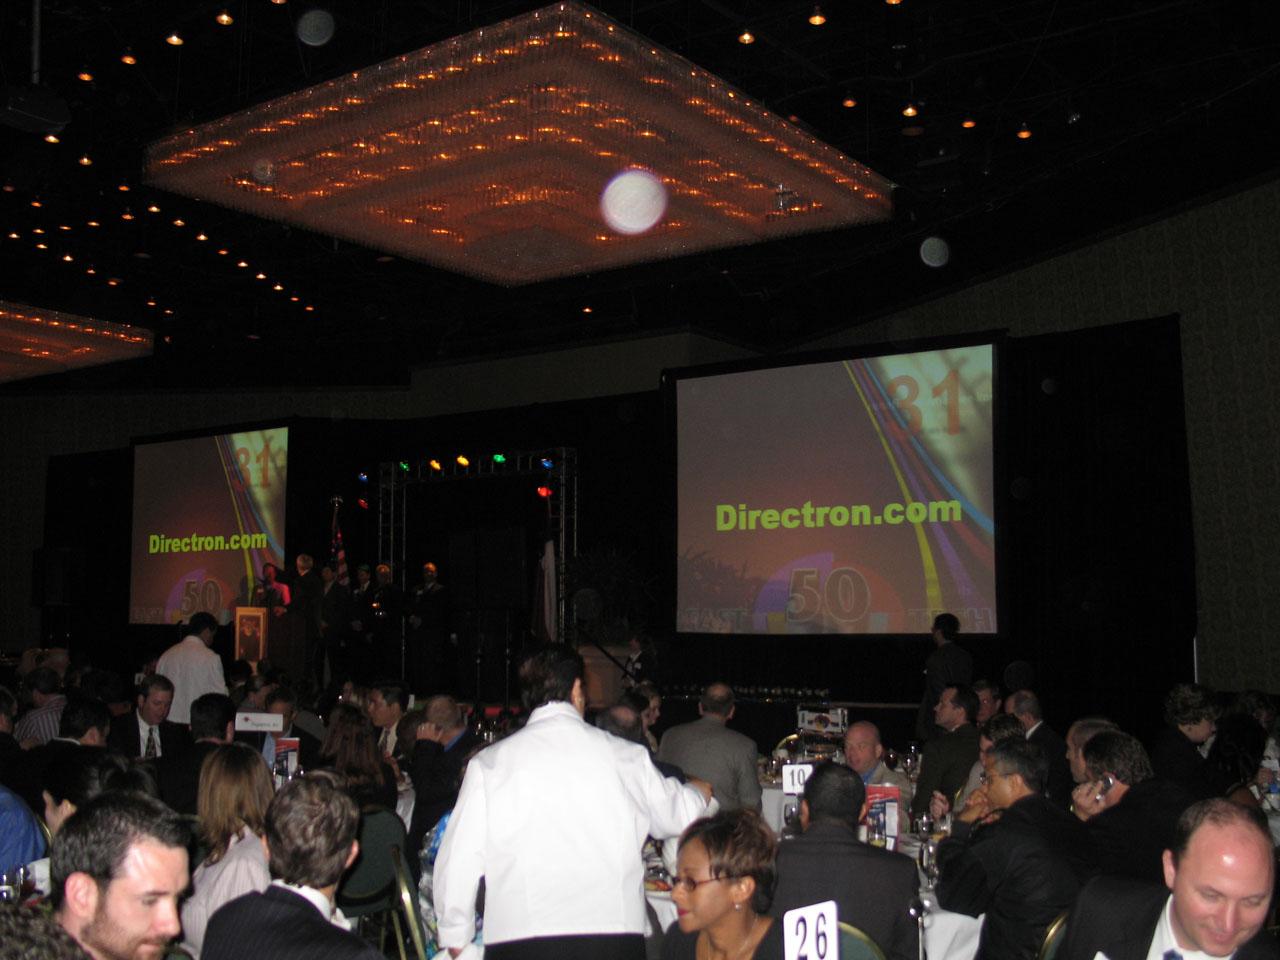 Directron.com won Fast Tech 50 Award from Houston Business Journal